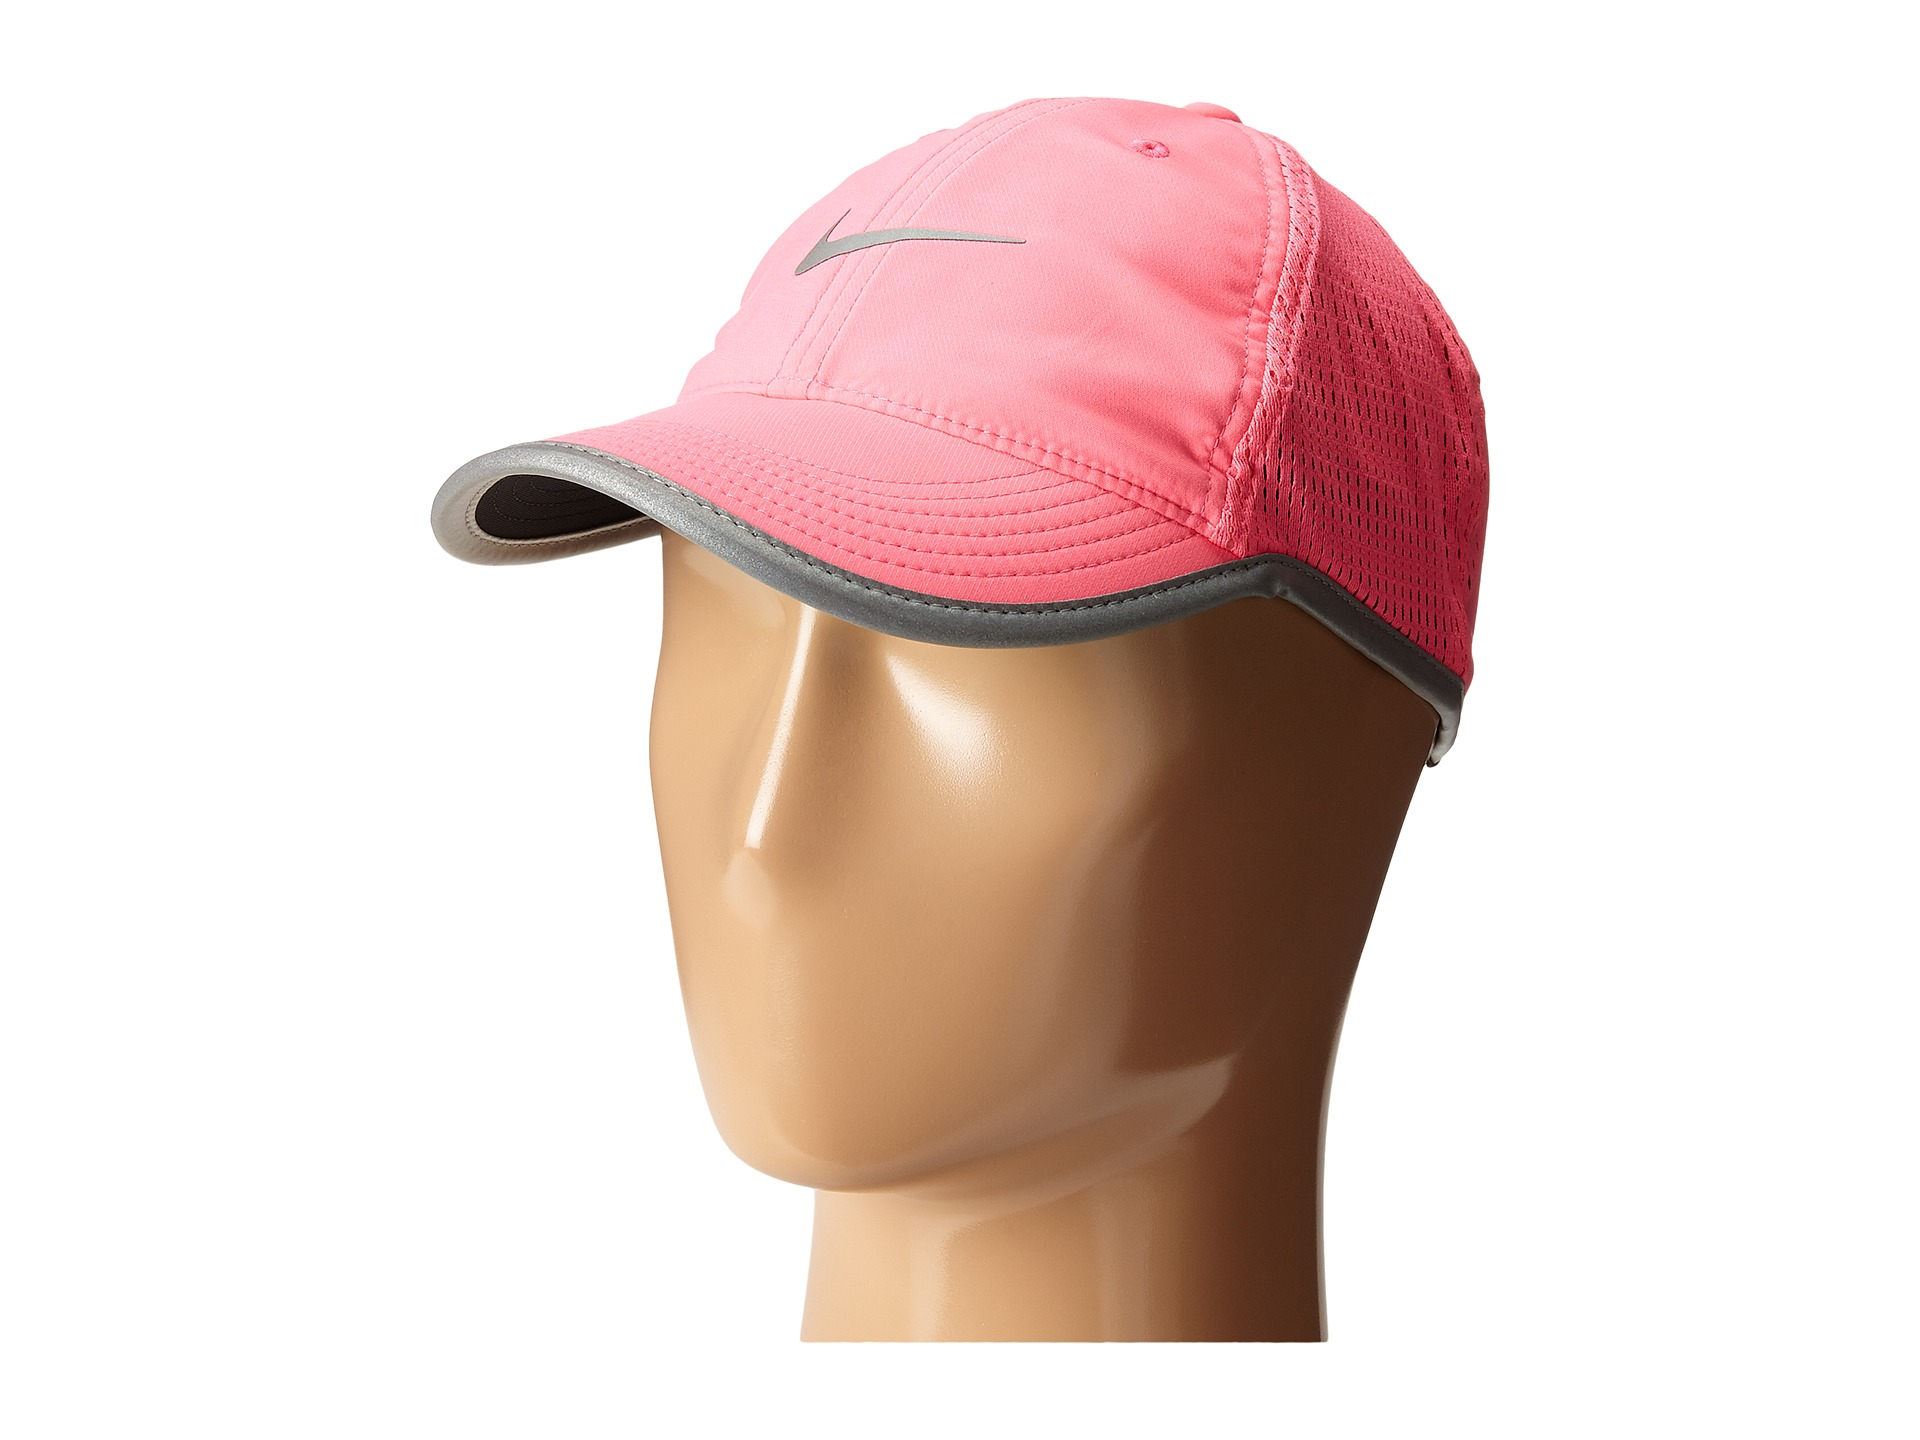 Lyst - Nike Run Knit Mesh Cap in Pink for Men 617cb8d90dd